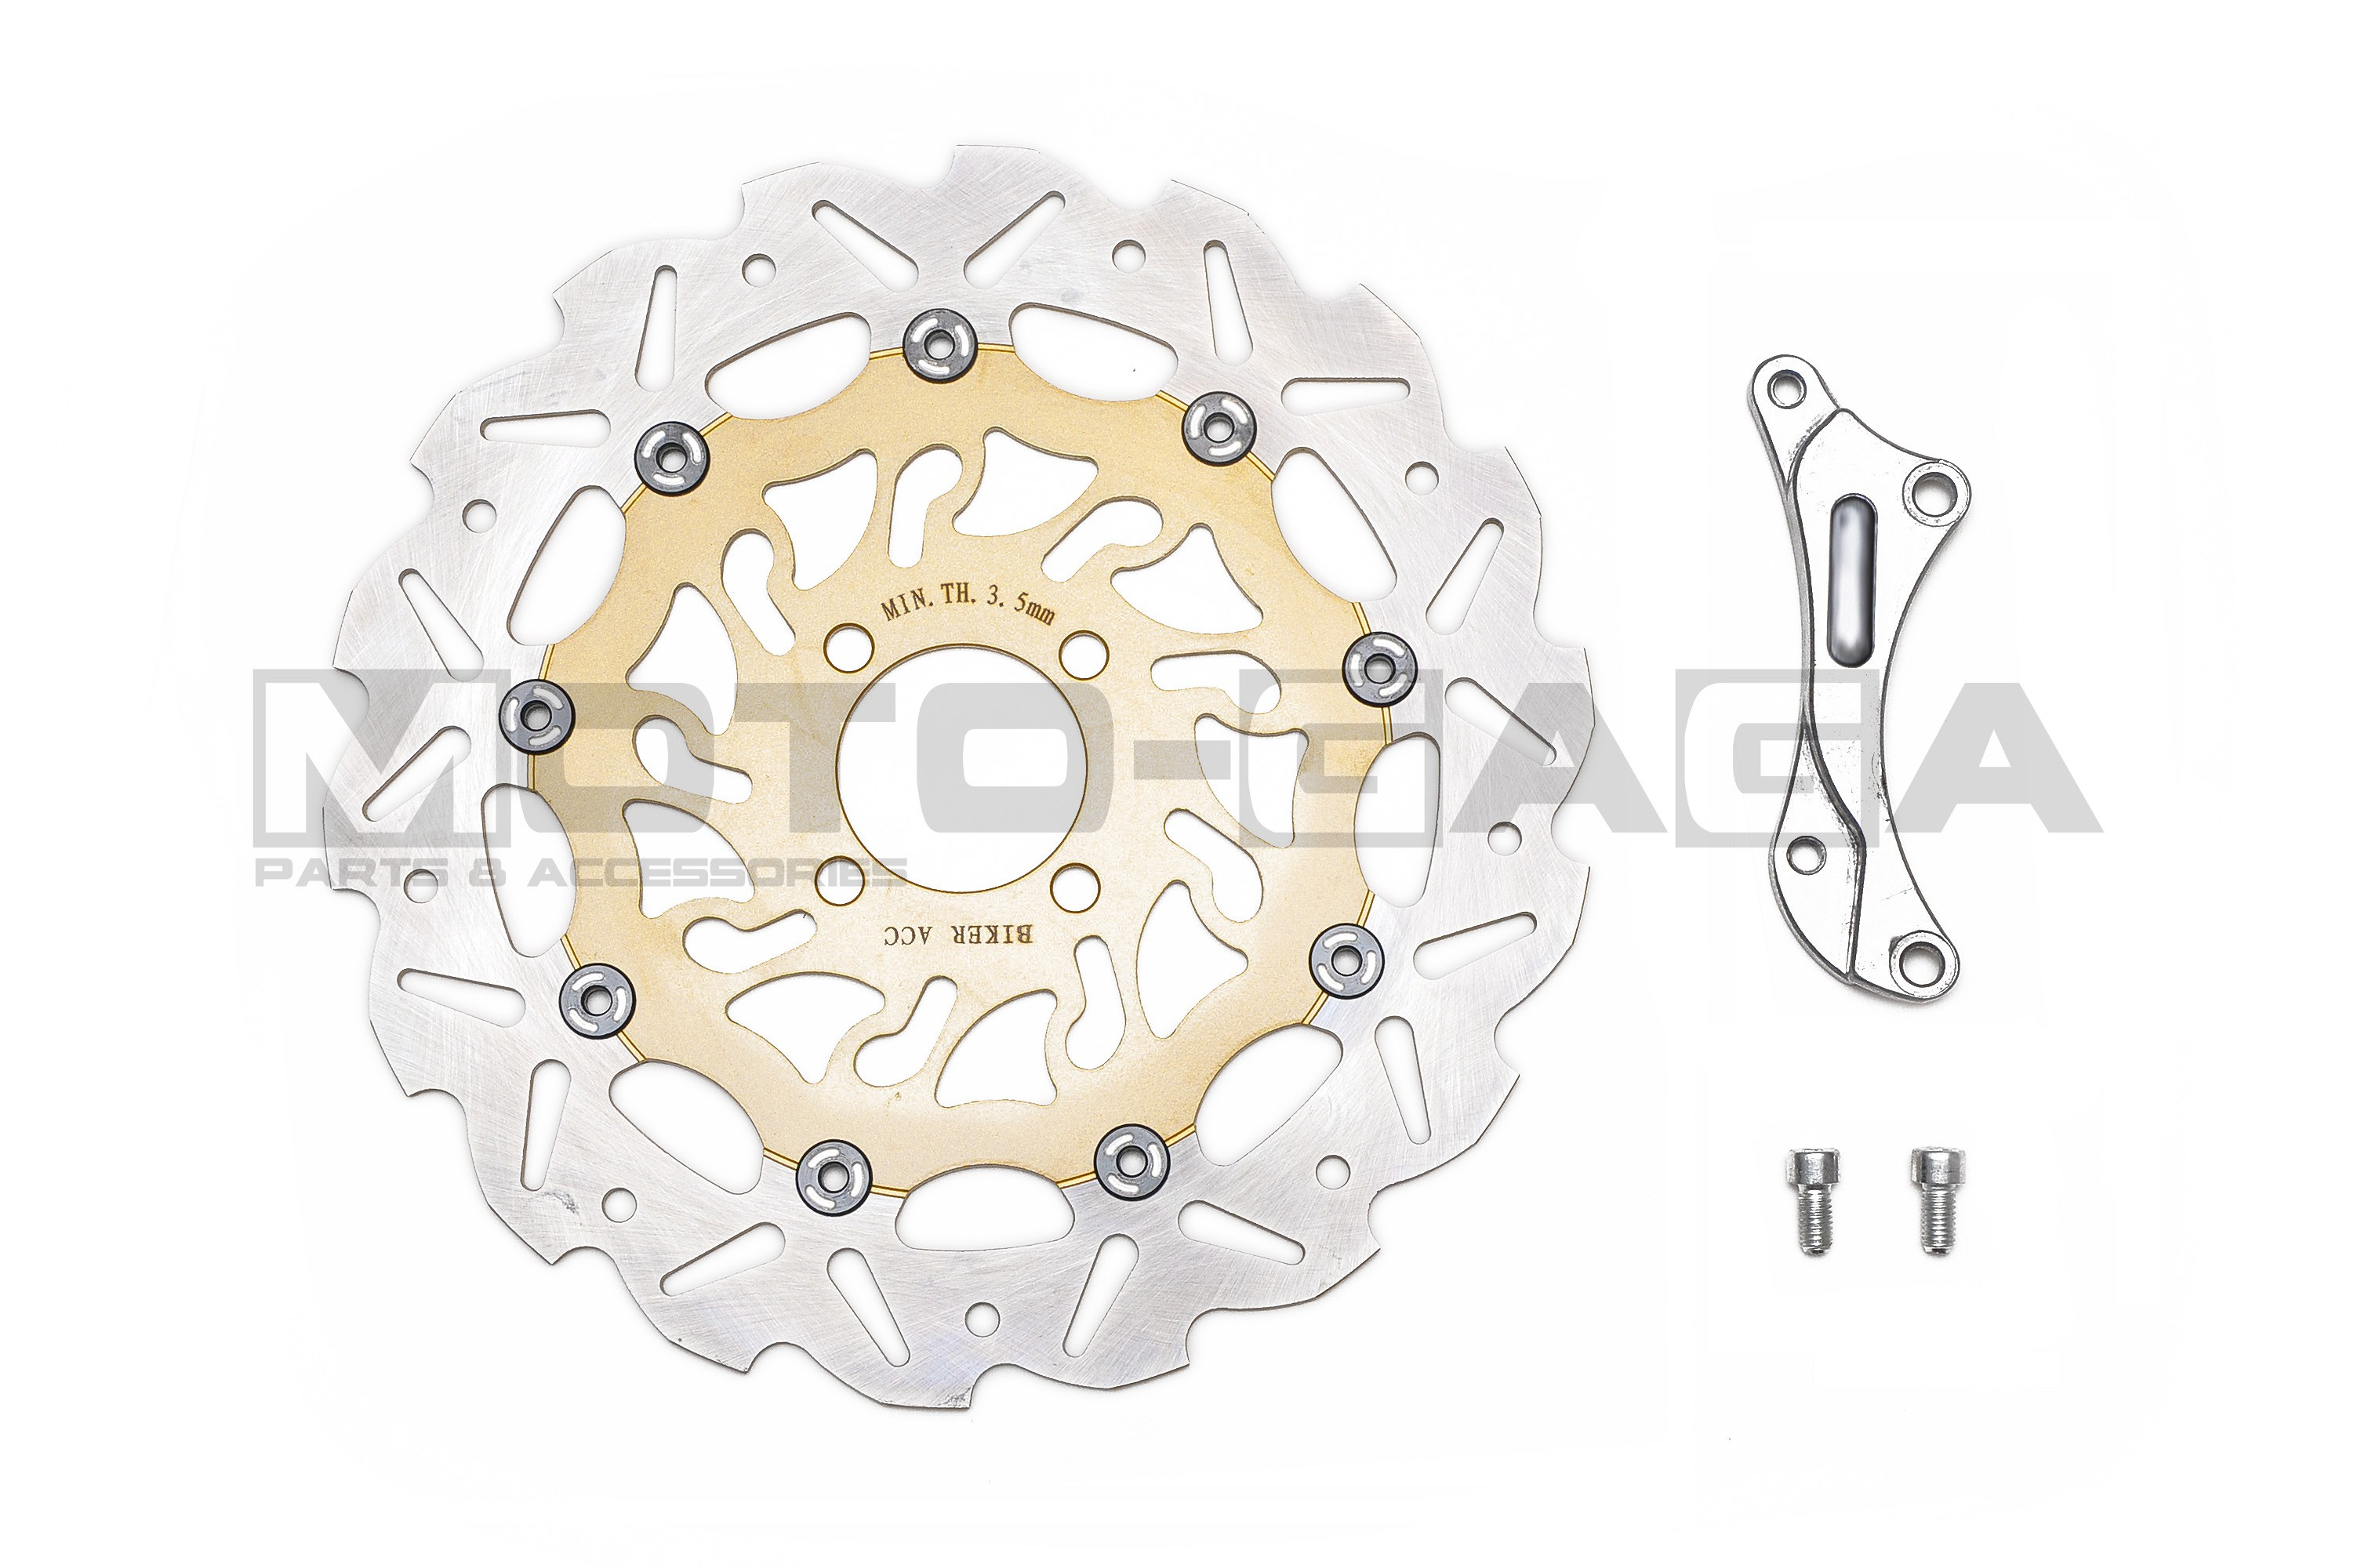 Wiring Diagram Ecu New Vixion : Yamaha r parts diagram html imageresizertool